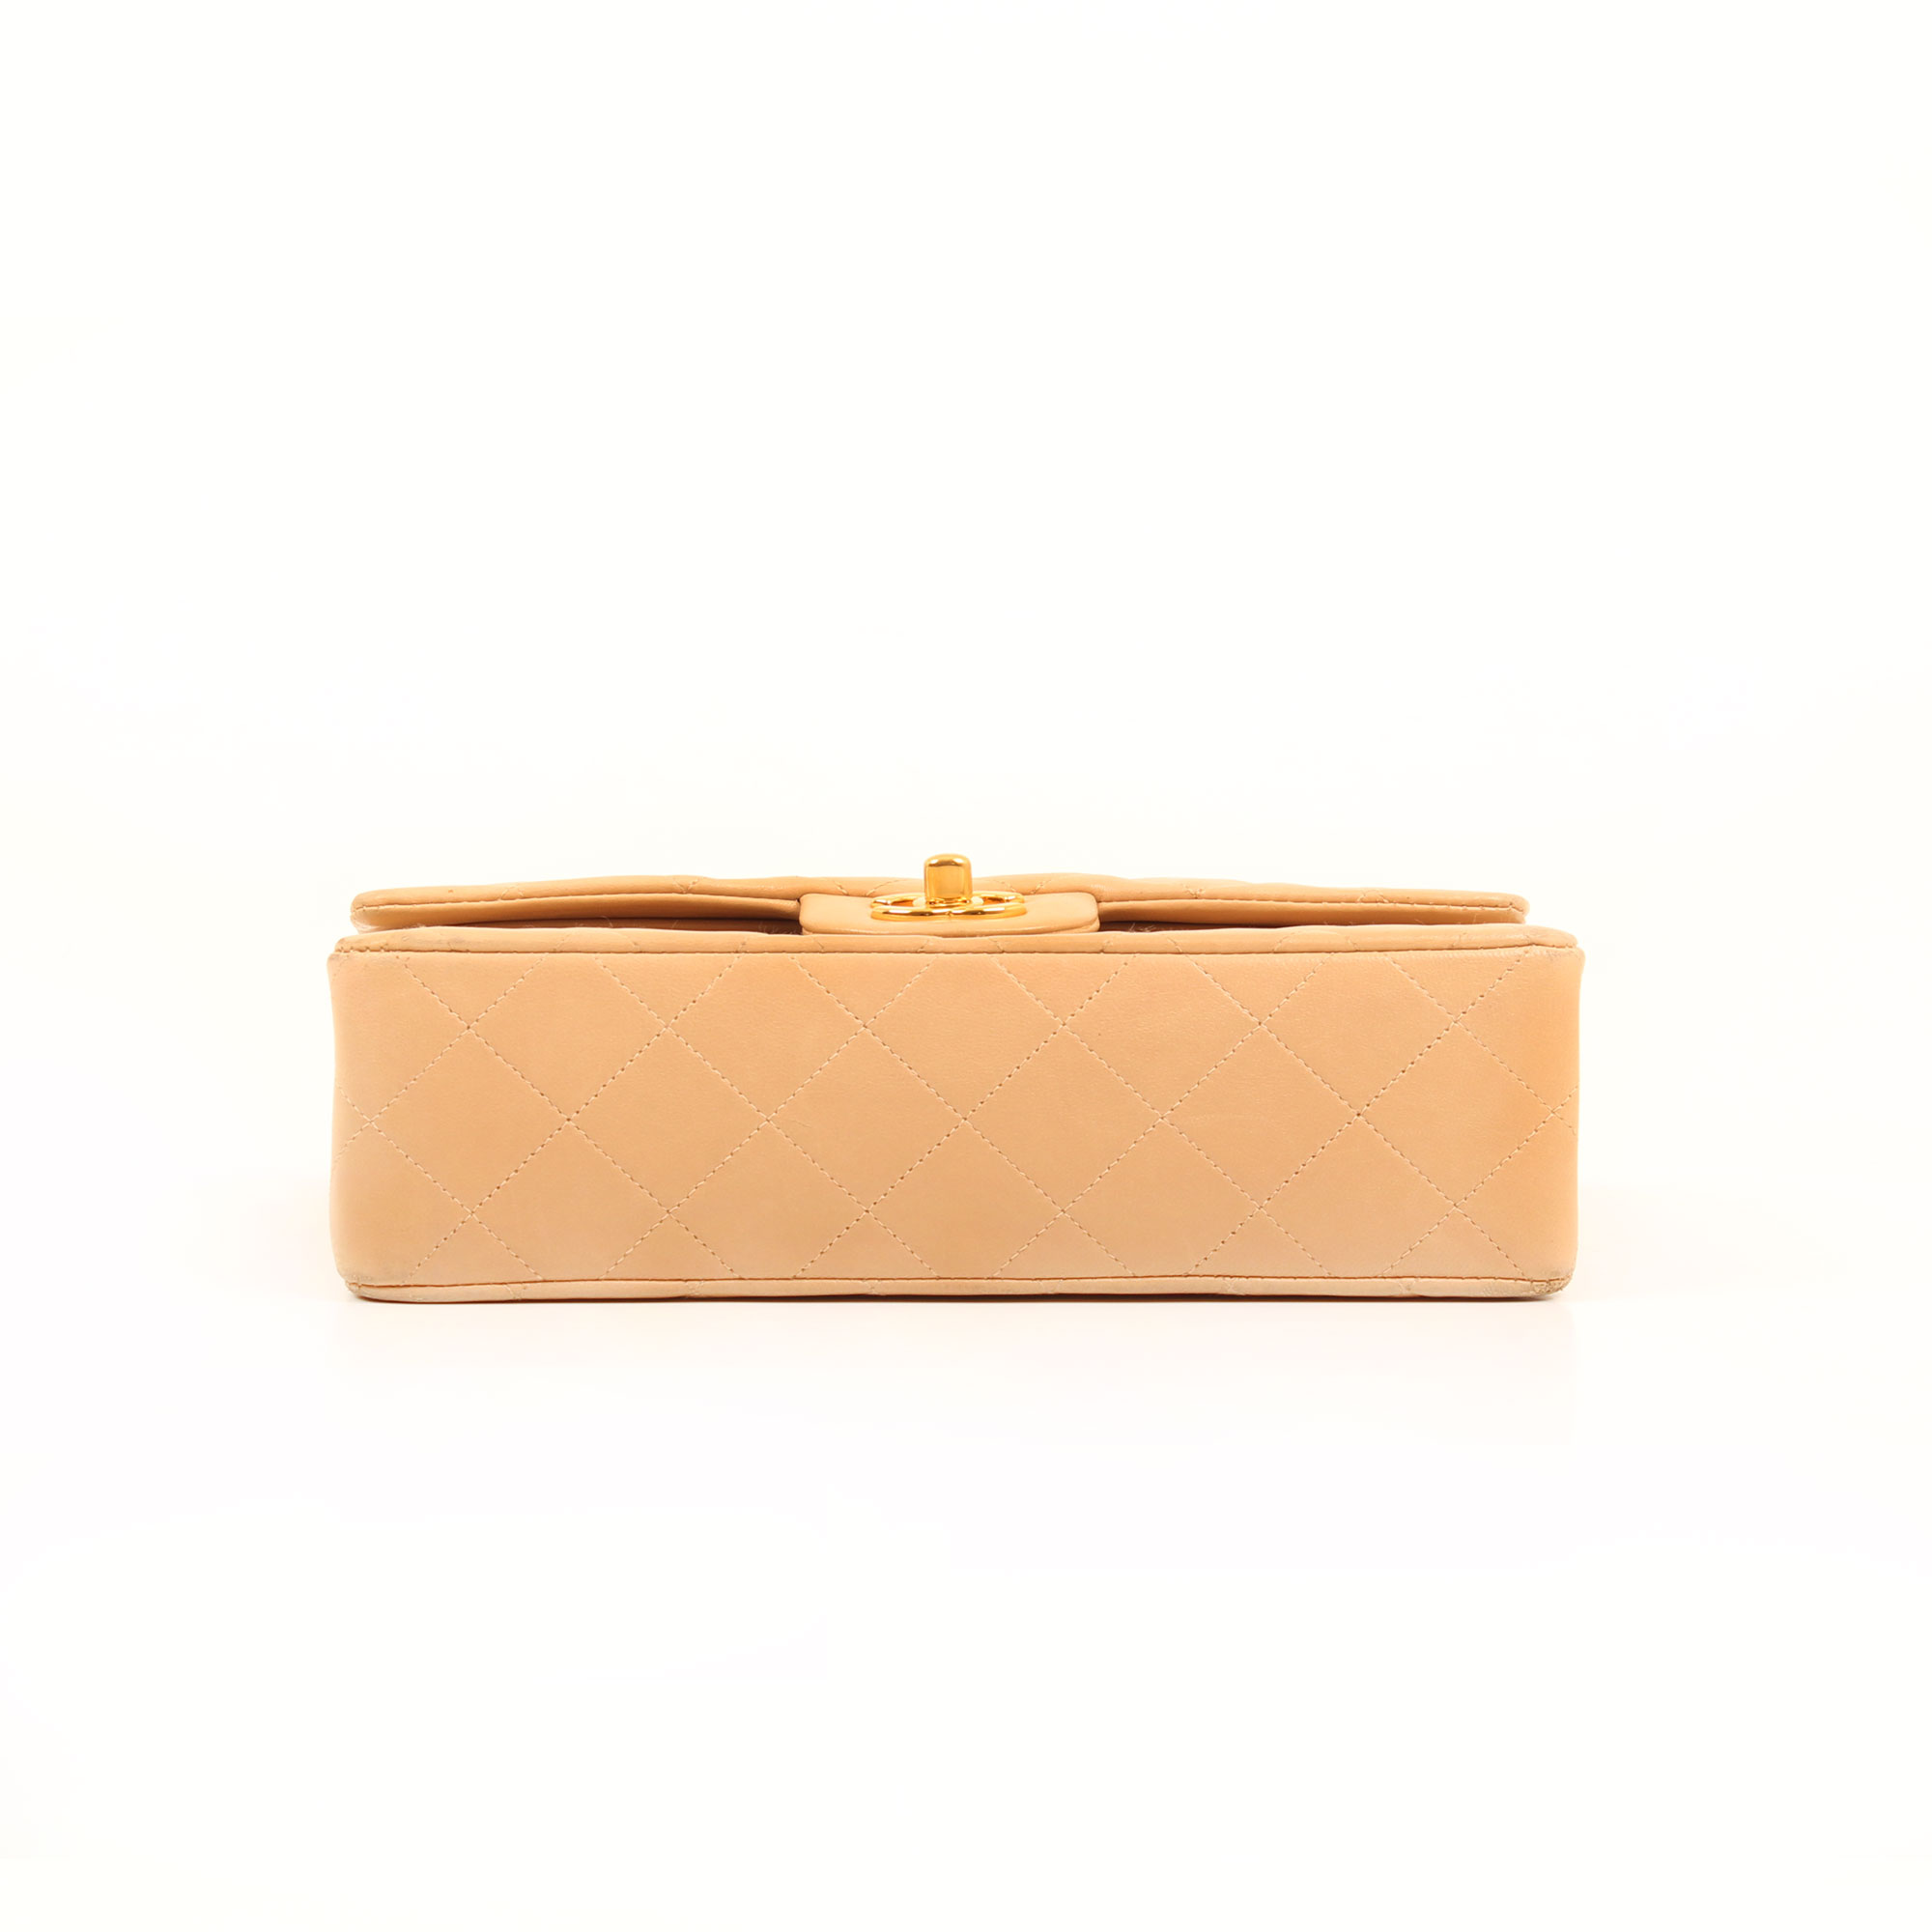 Imagen de la base del bolso chanel classic double flap beige